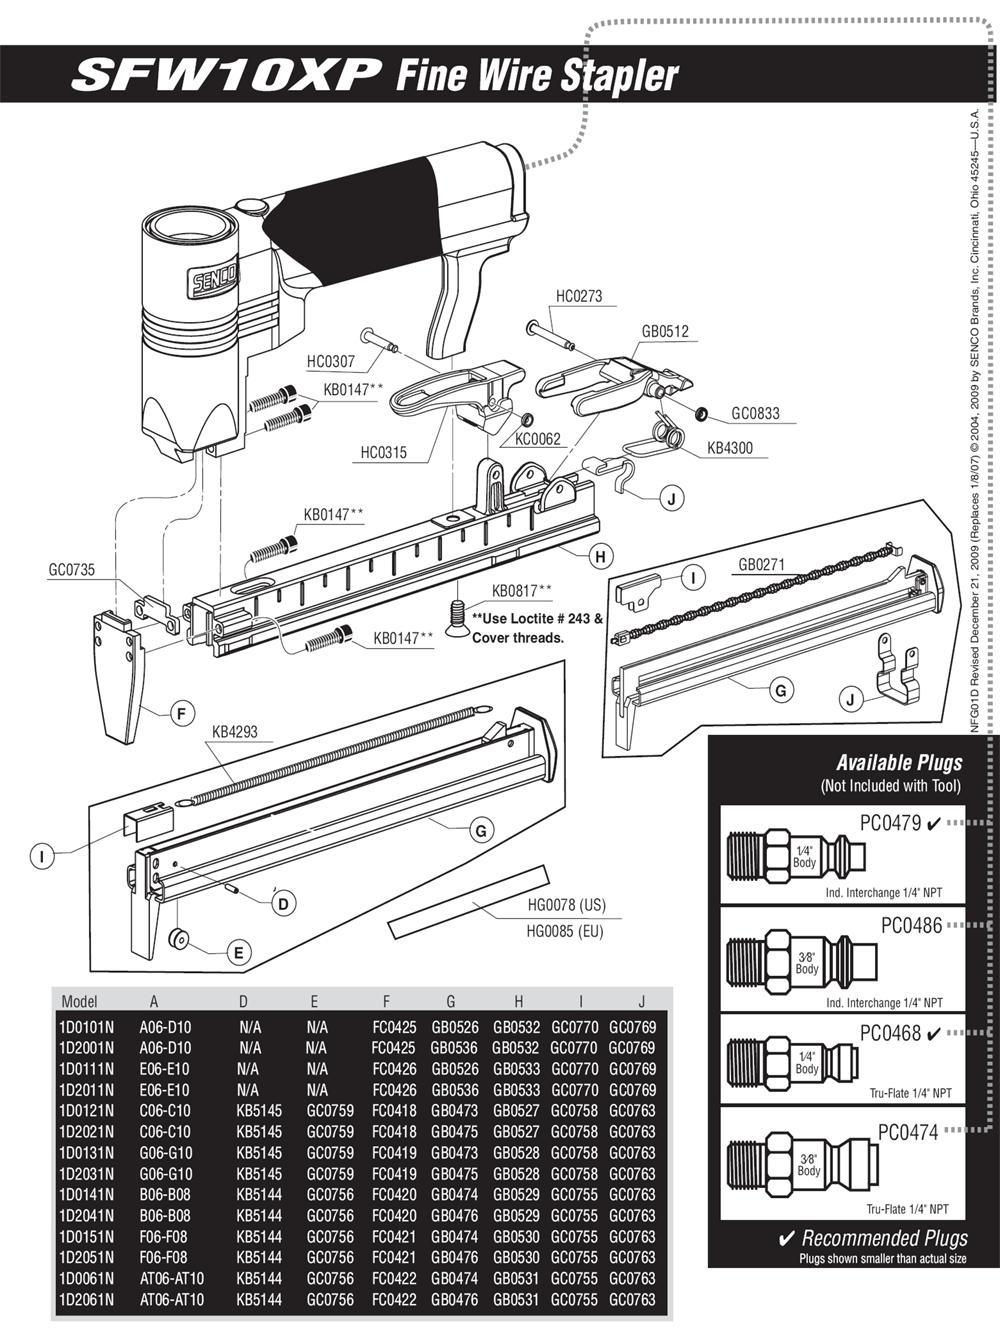 1D0111N-senco-PB-1Break Down